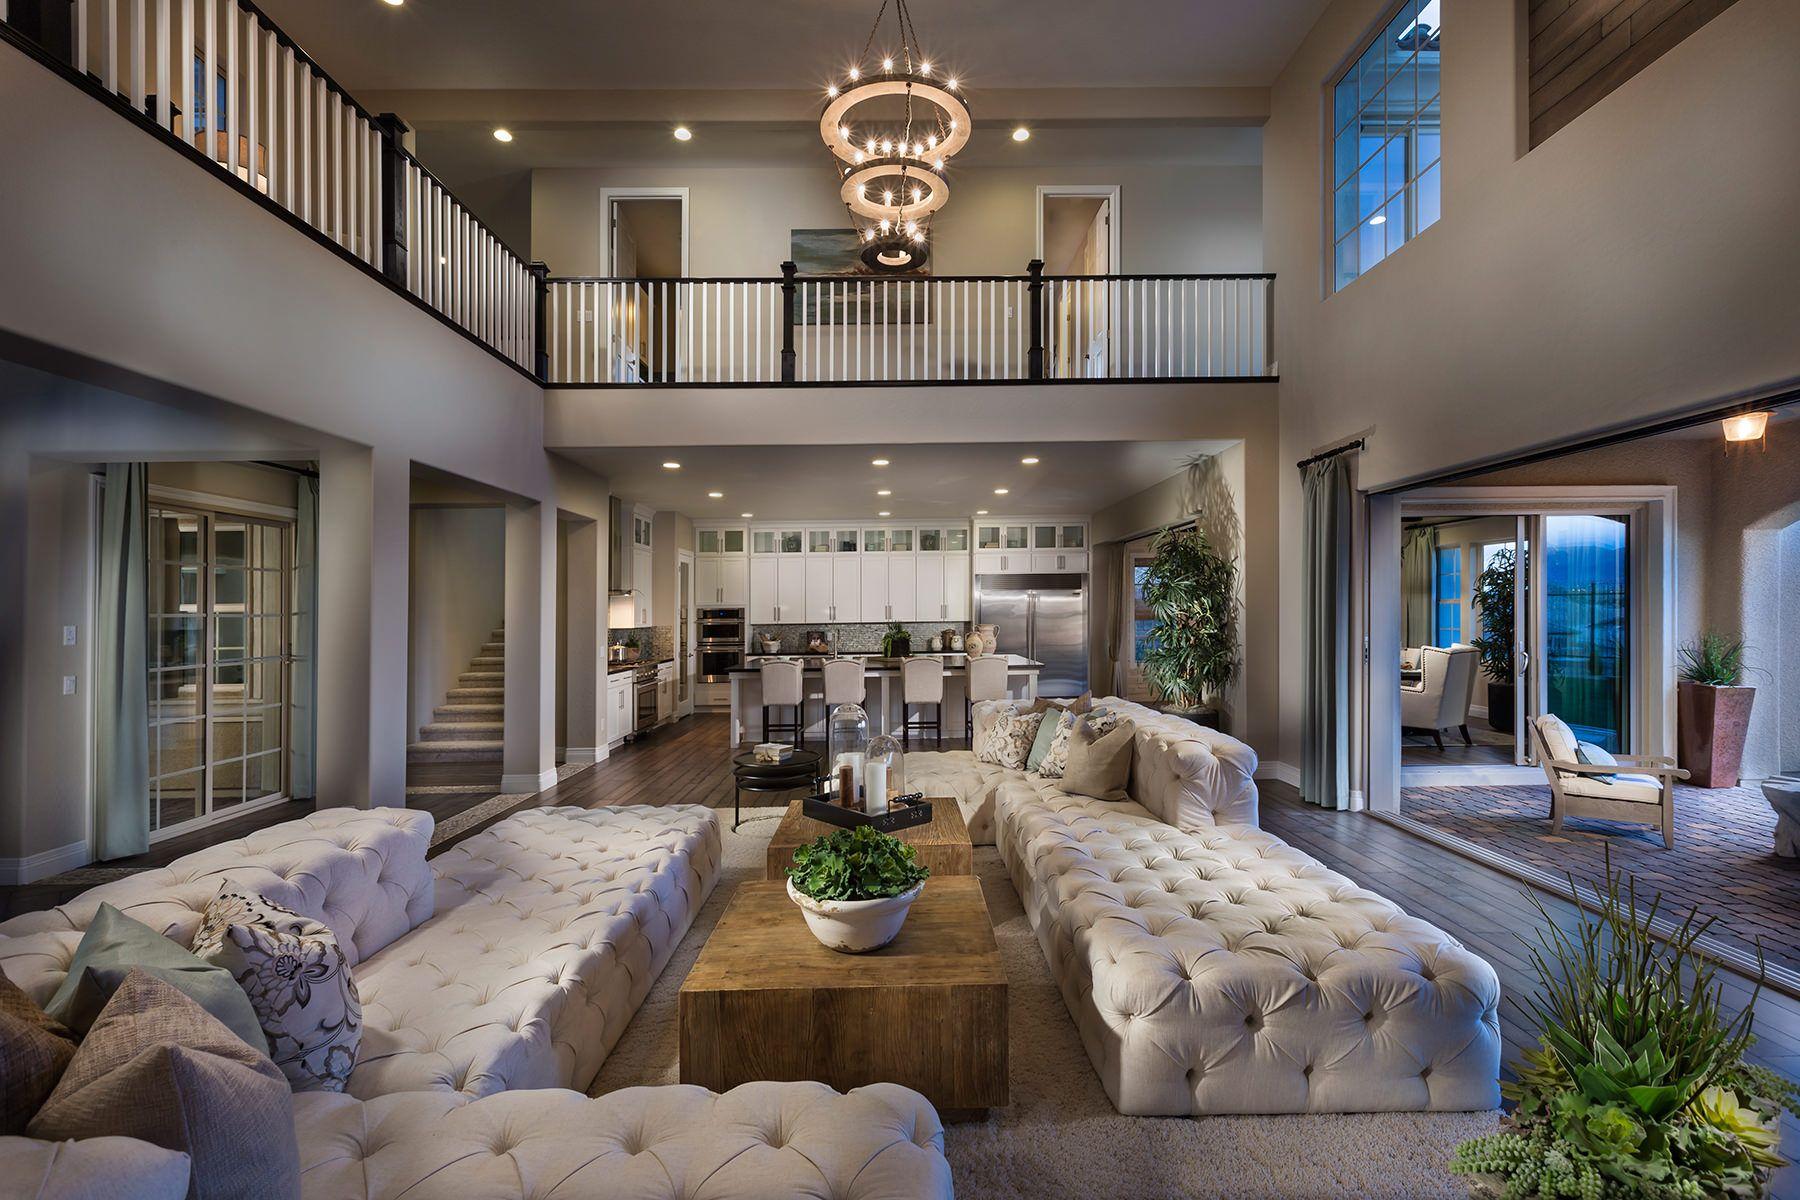 ambrosia interior design livingrooms pinterest interiors open floor and living rooms